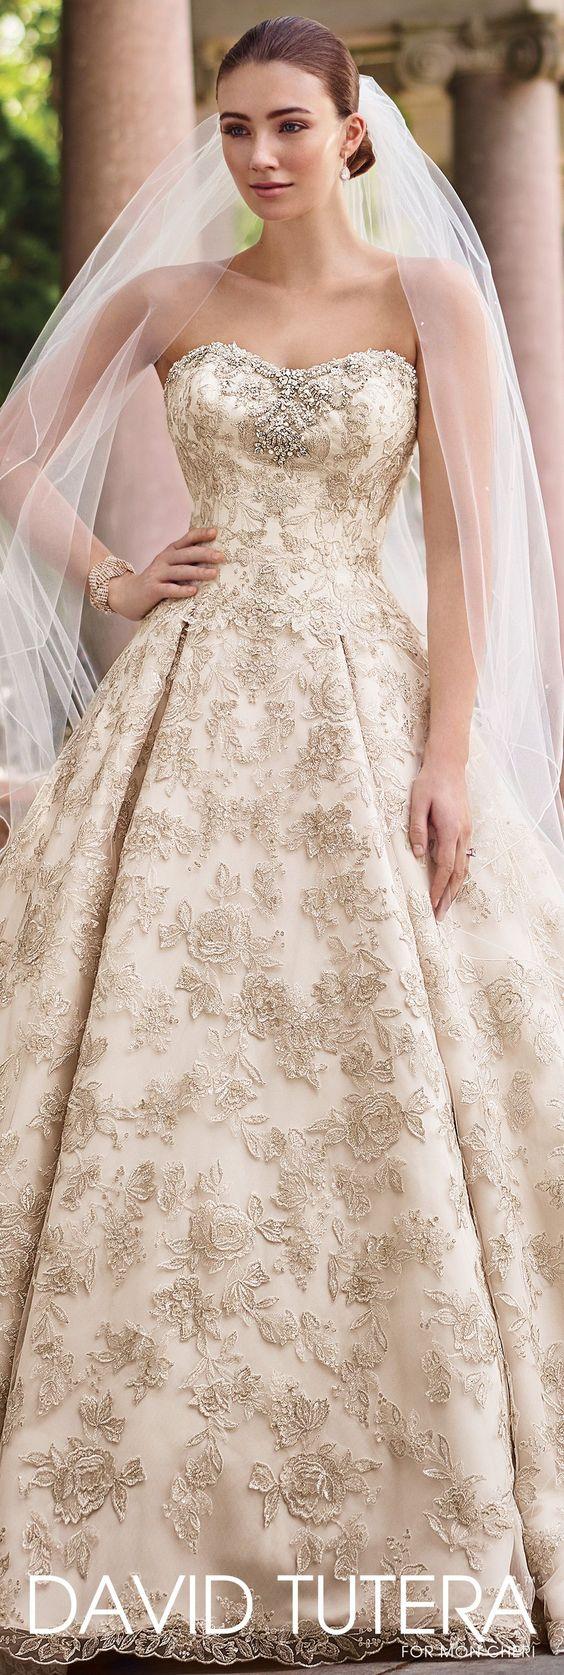 David Tutera for Mon Cheri Spring 2017 Collection - Style No. 117274 Gilda - strapless gold metallic lace ball gown wedding dress